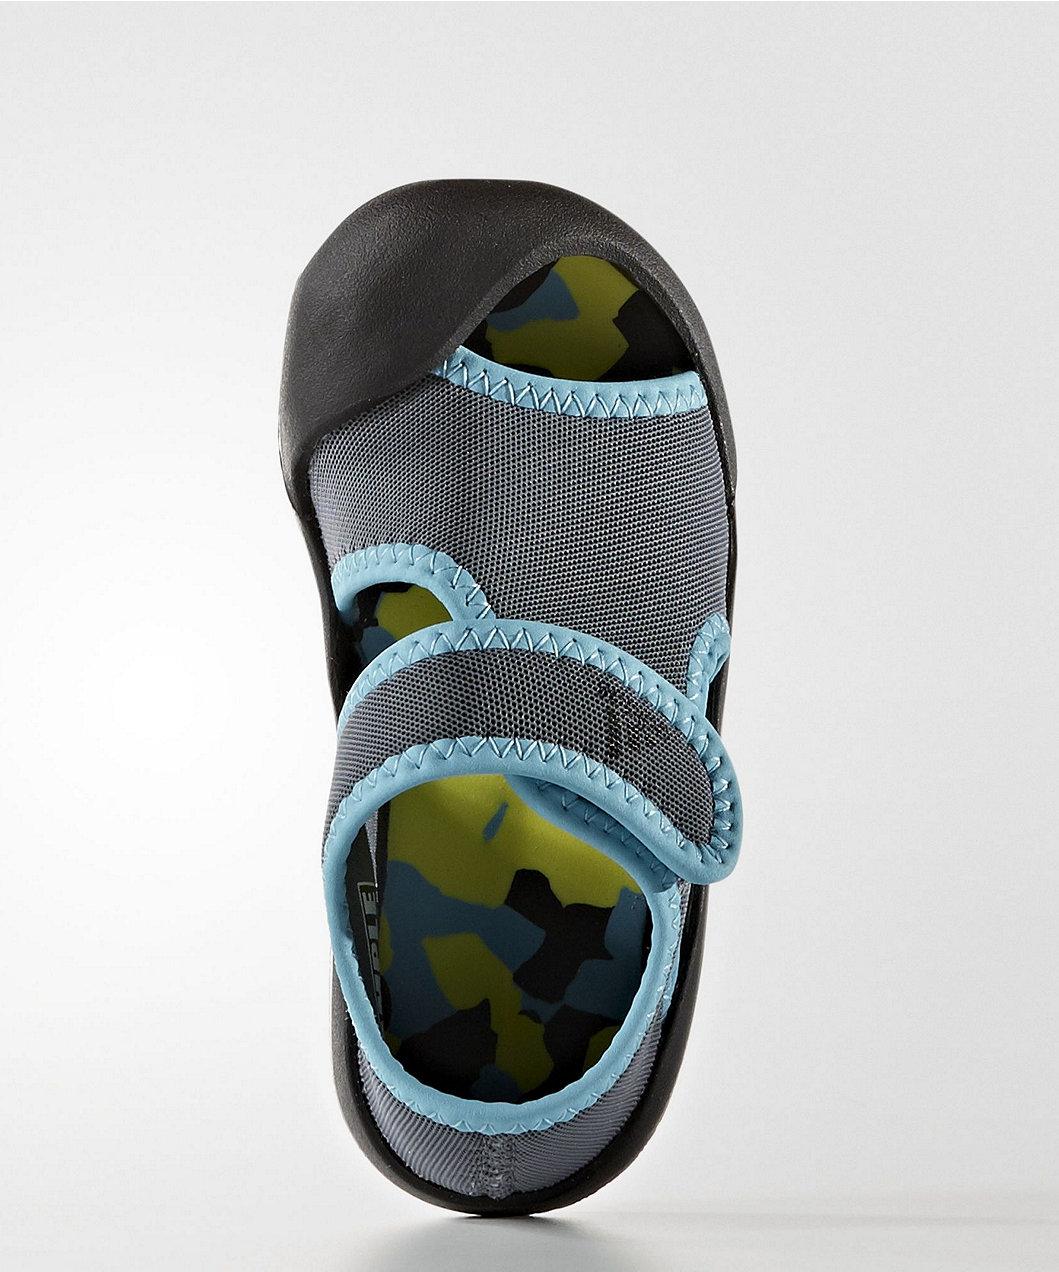 041c98f7be162 Sandal Fun Mothercare Onix Indonesia Training Adidas qAwvFzTx